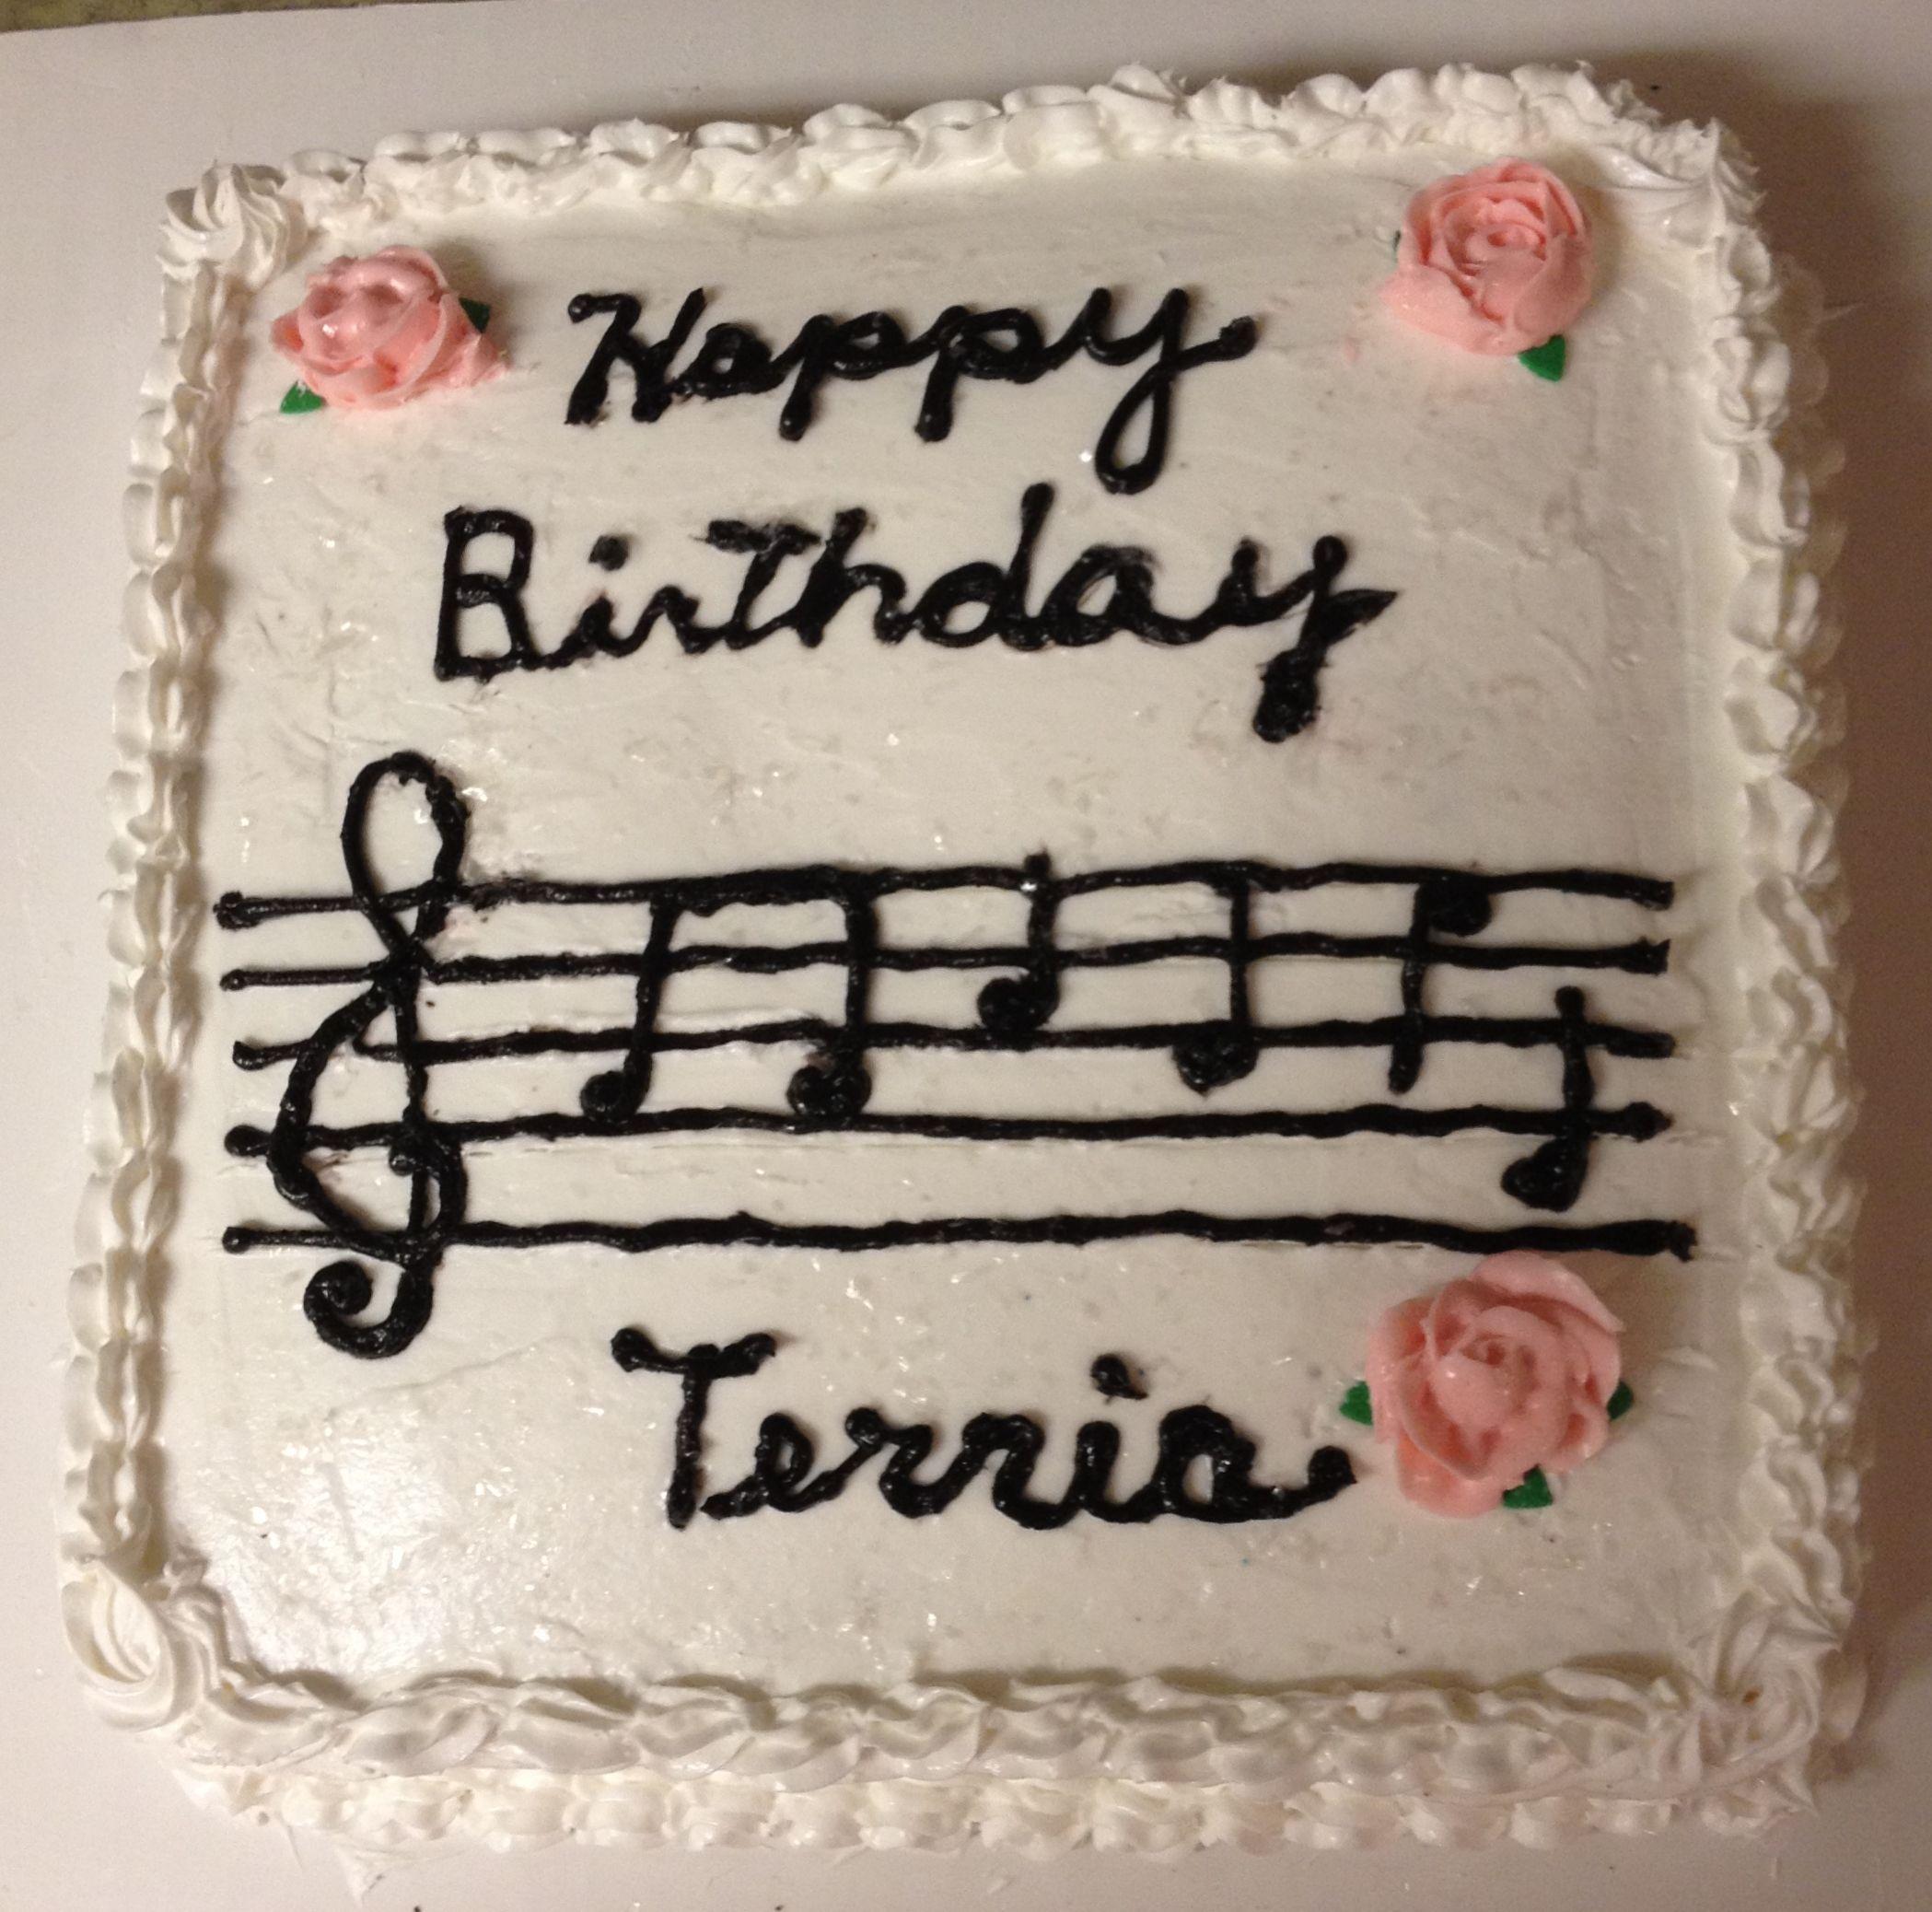 "Musical"" gluten free birthday cake I made for my friend s pastor"